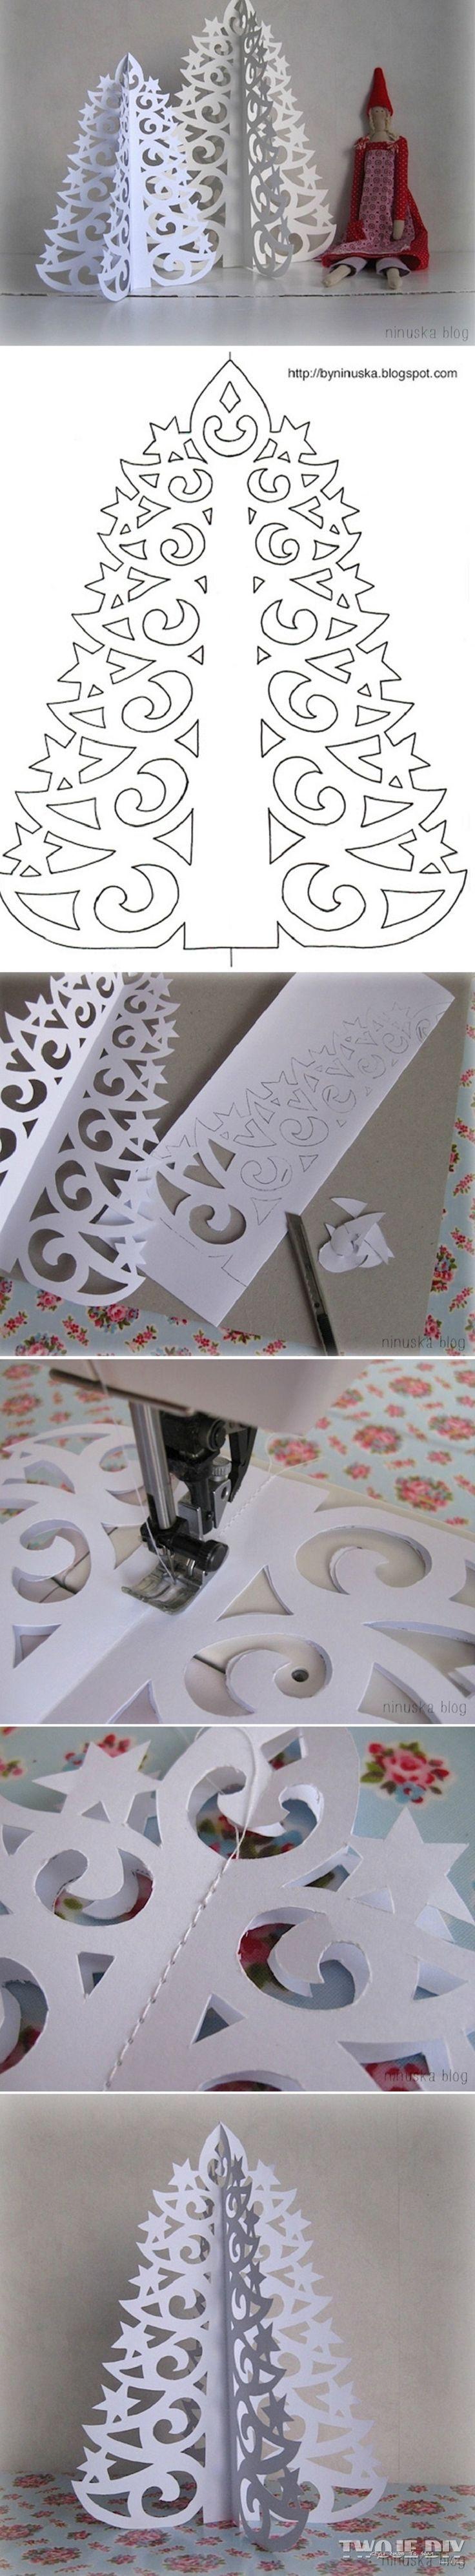 White Christmas Tree Decorations | DIY